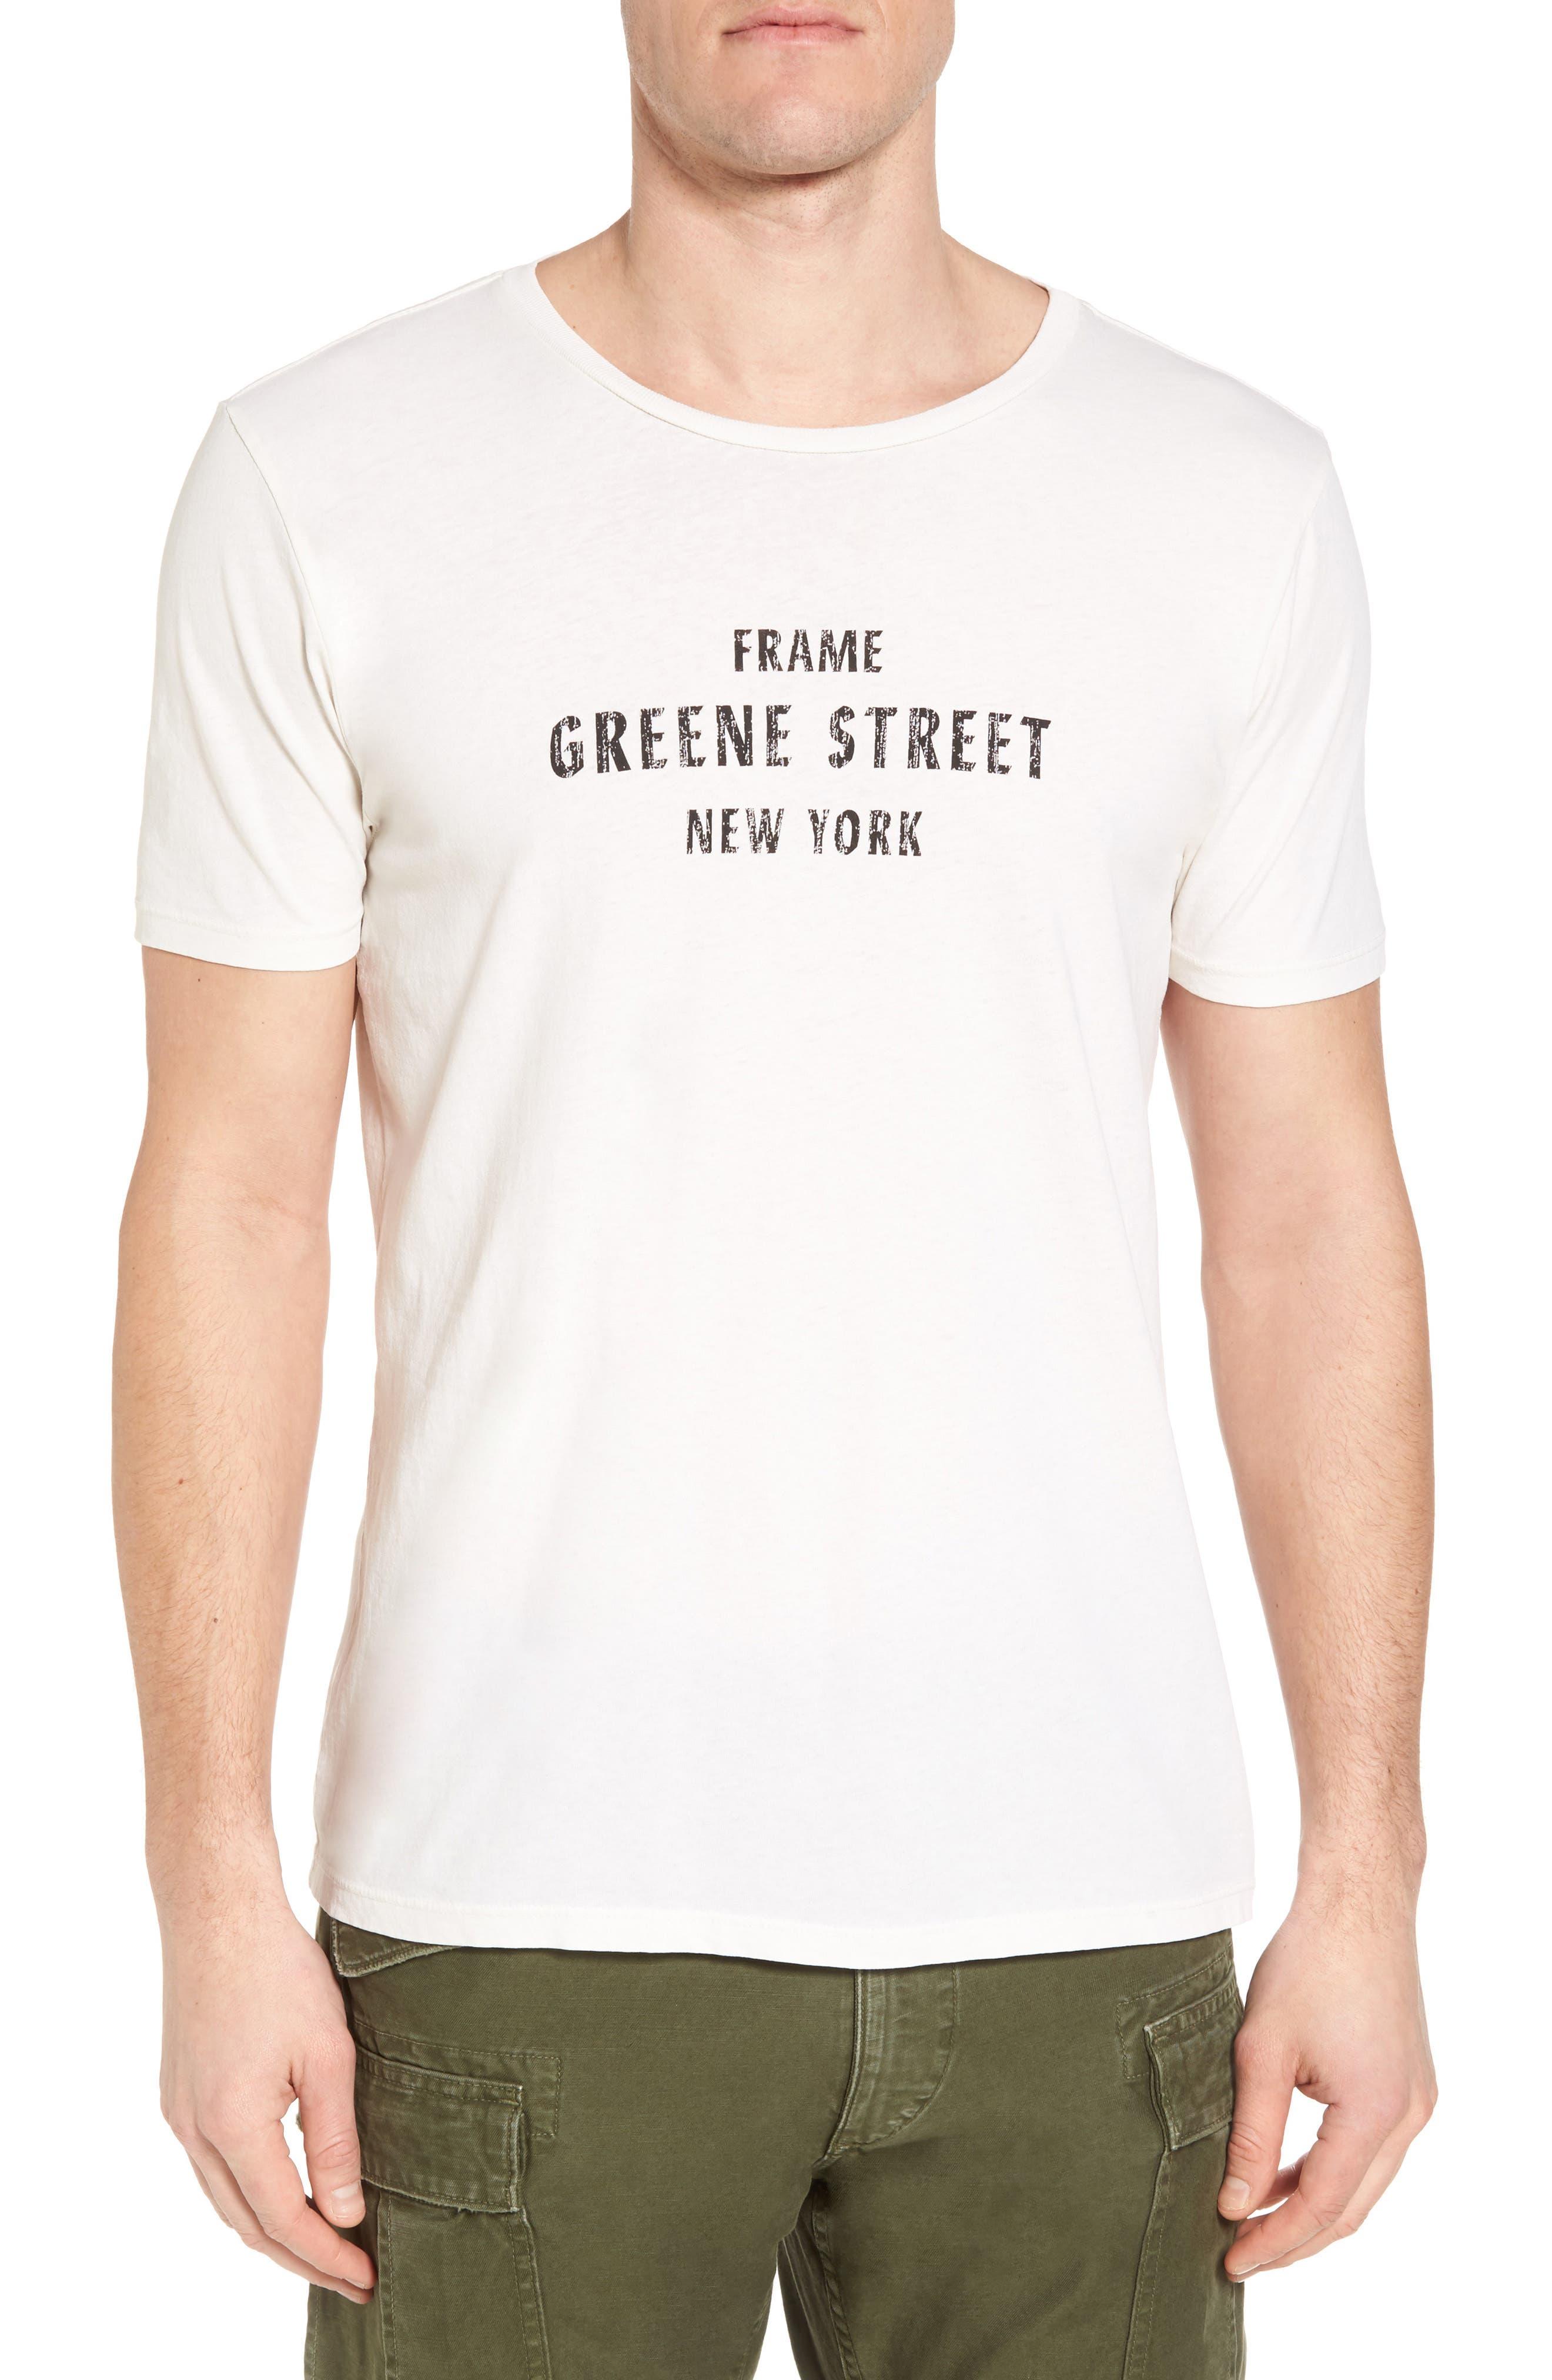 FRAME Greene Street Vintage Graphic T-Shirt